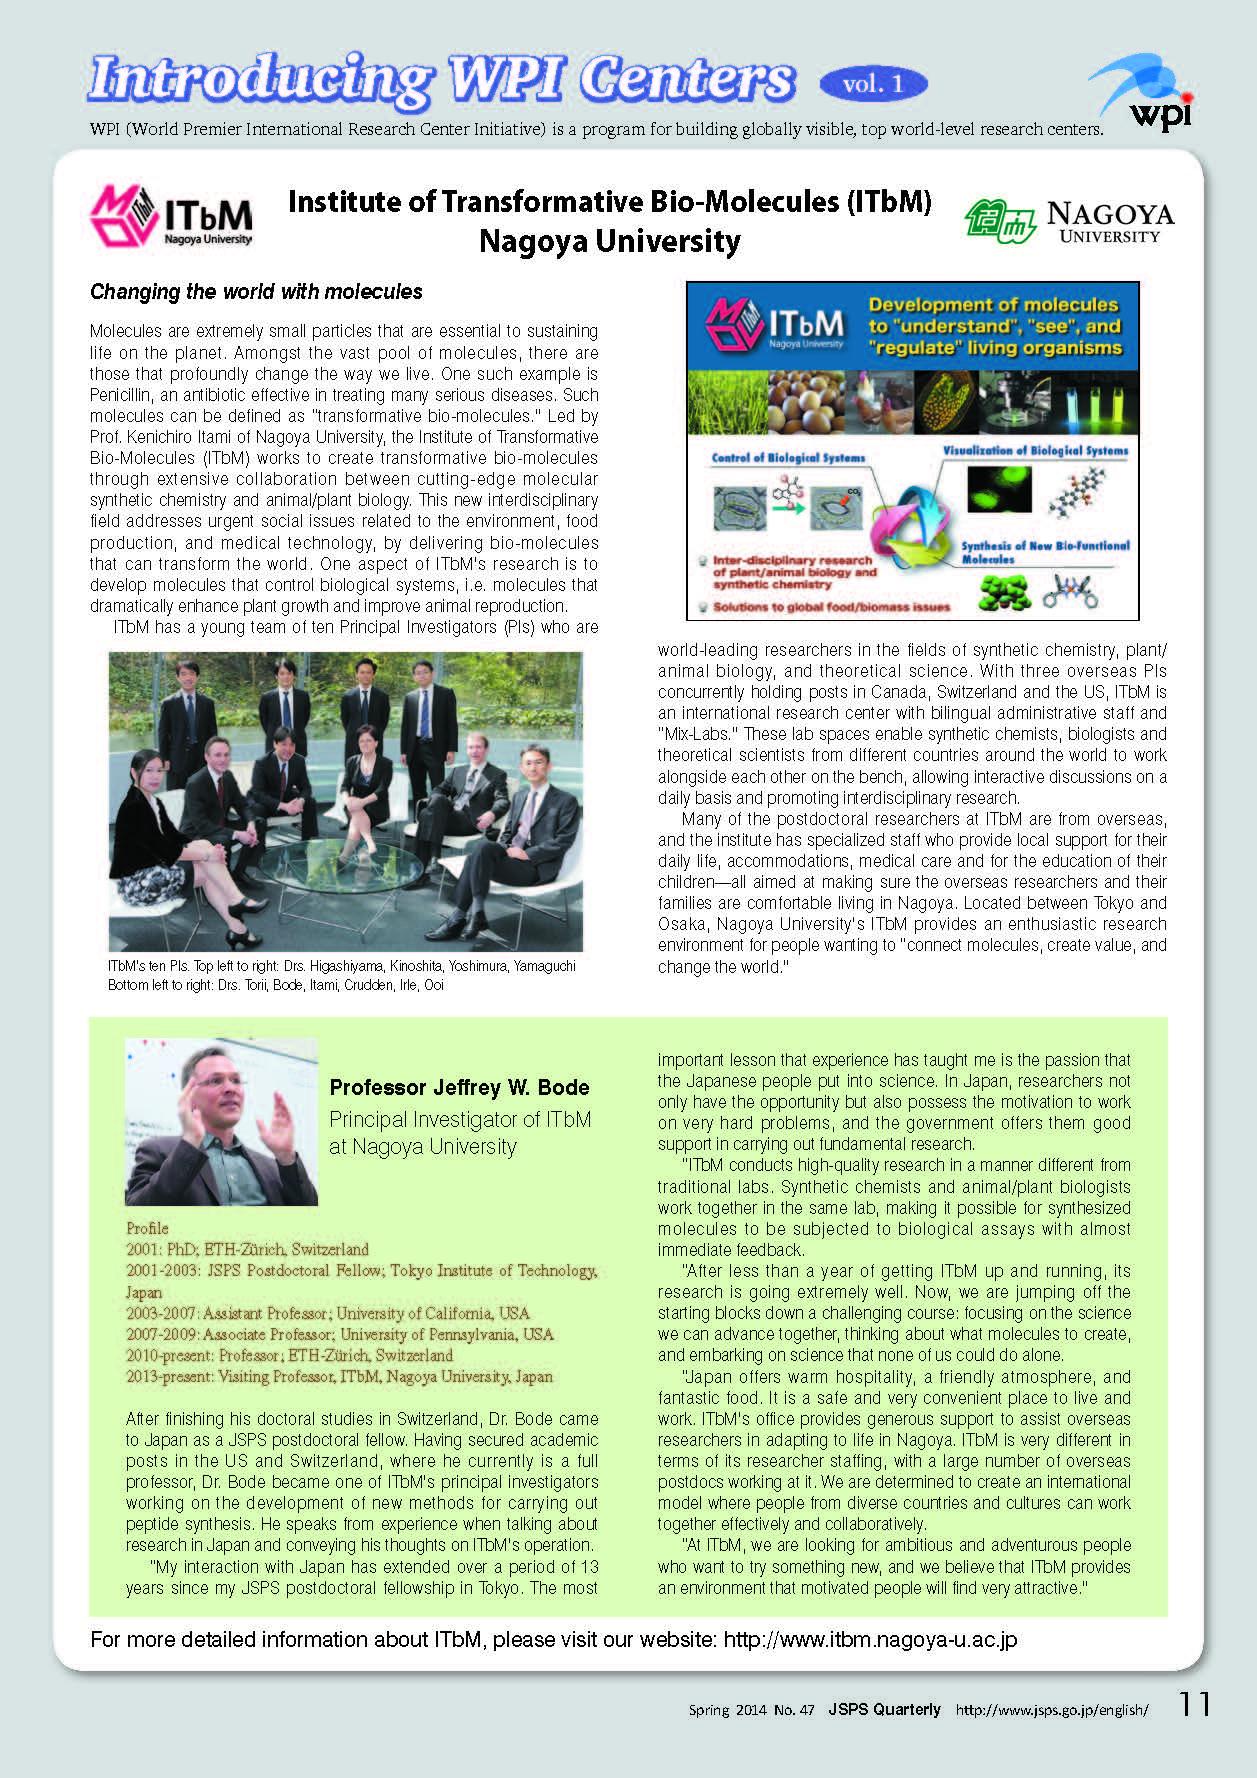 http://www.itbm.nagoya-u.ac.jp/ja/news/JSPS_Quarterly_No._47_WPI_200.jpg